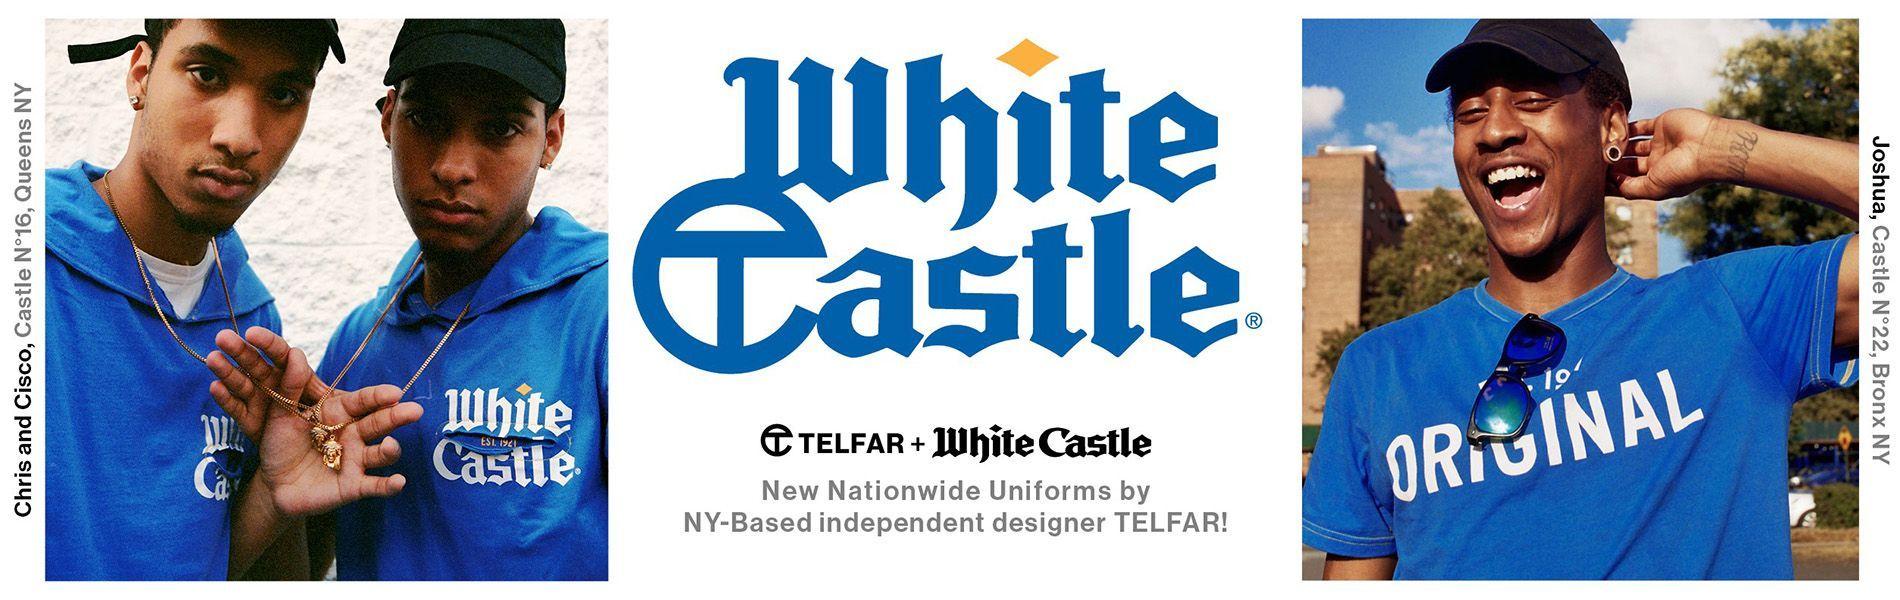 Uniformes White Castle x Telfar